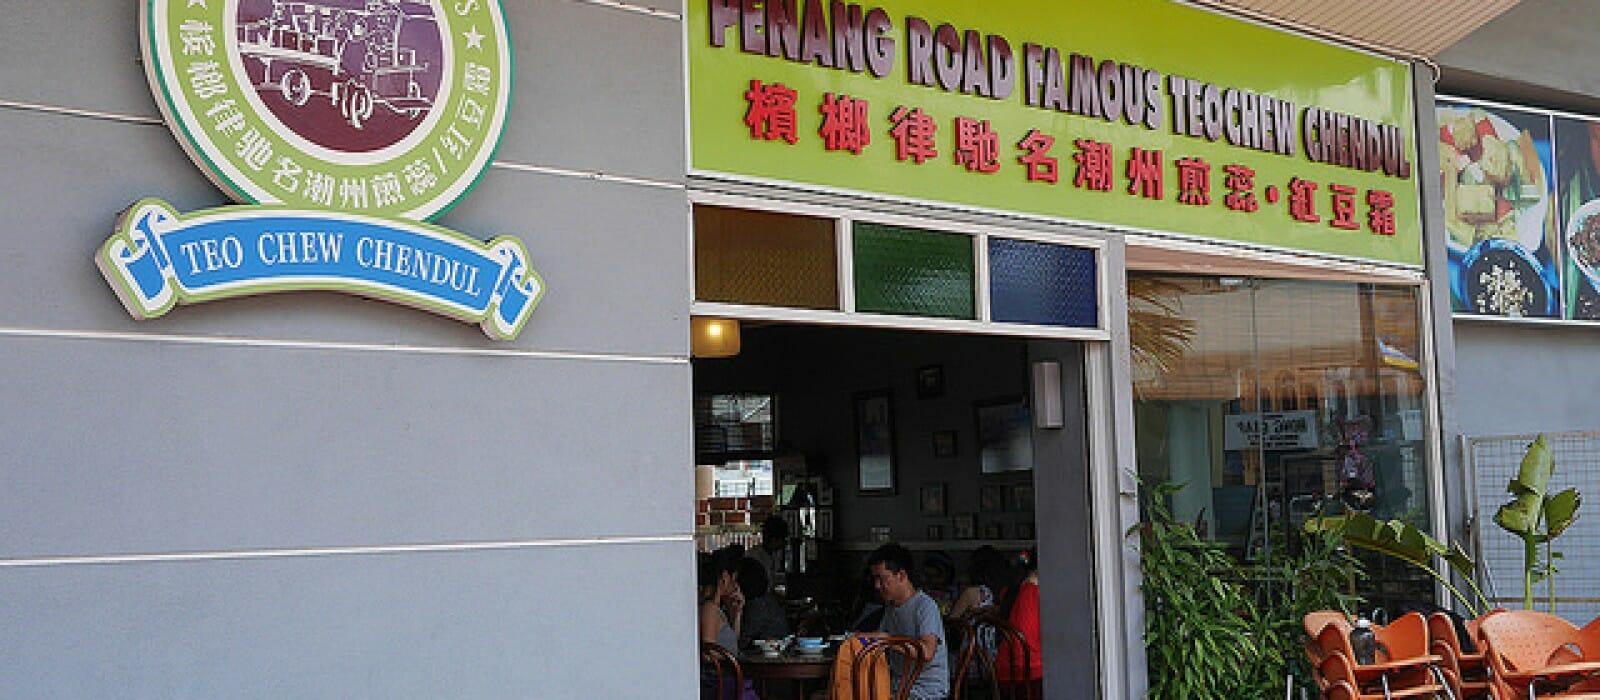 Famous TeoChew Chendul, Komtar Walk